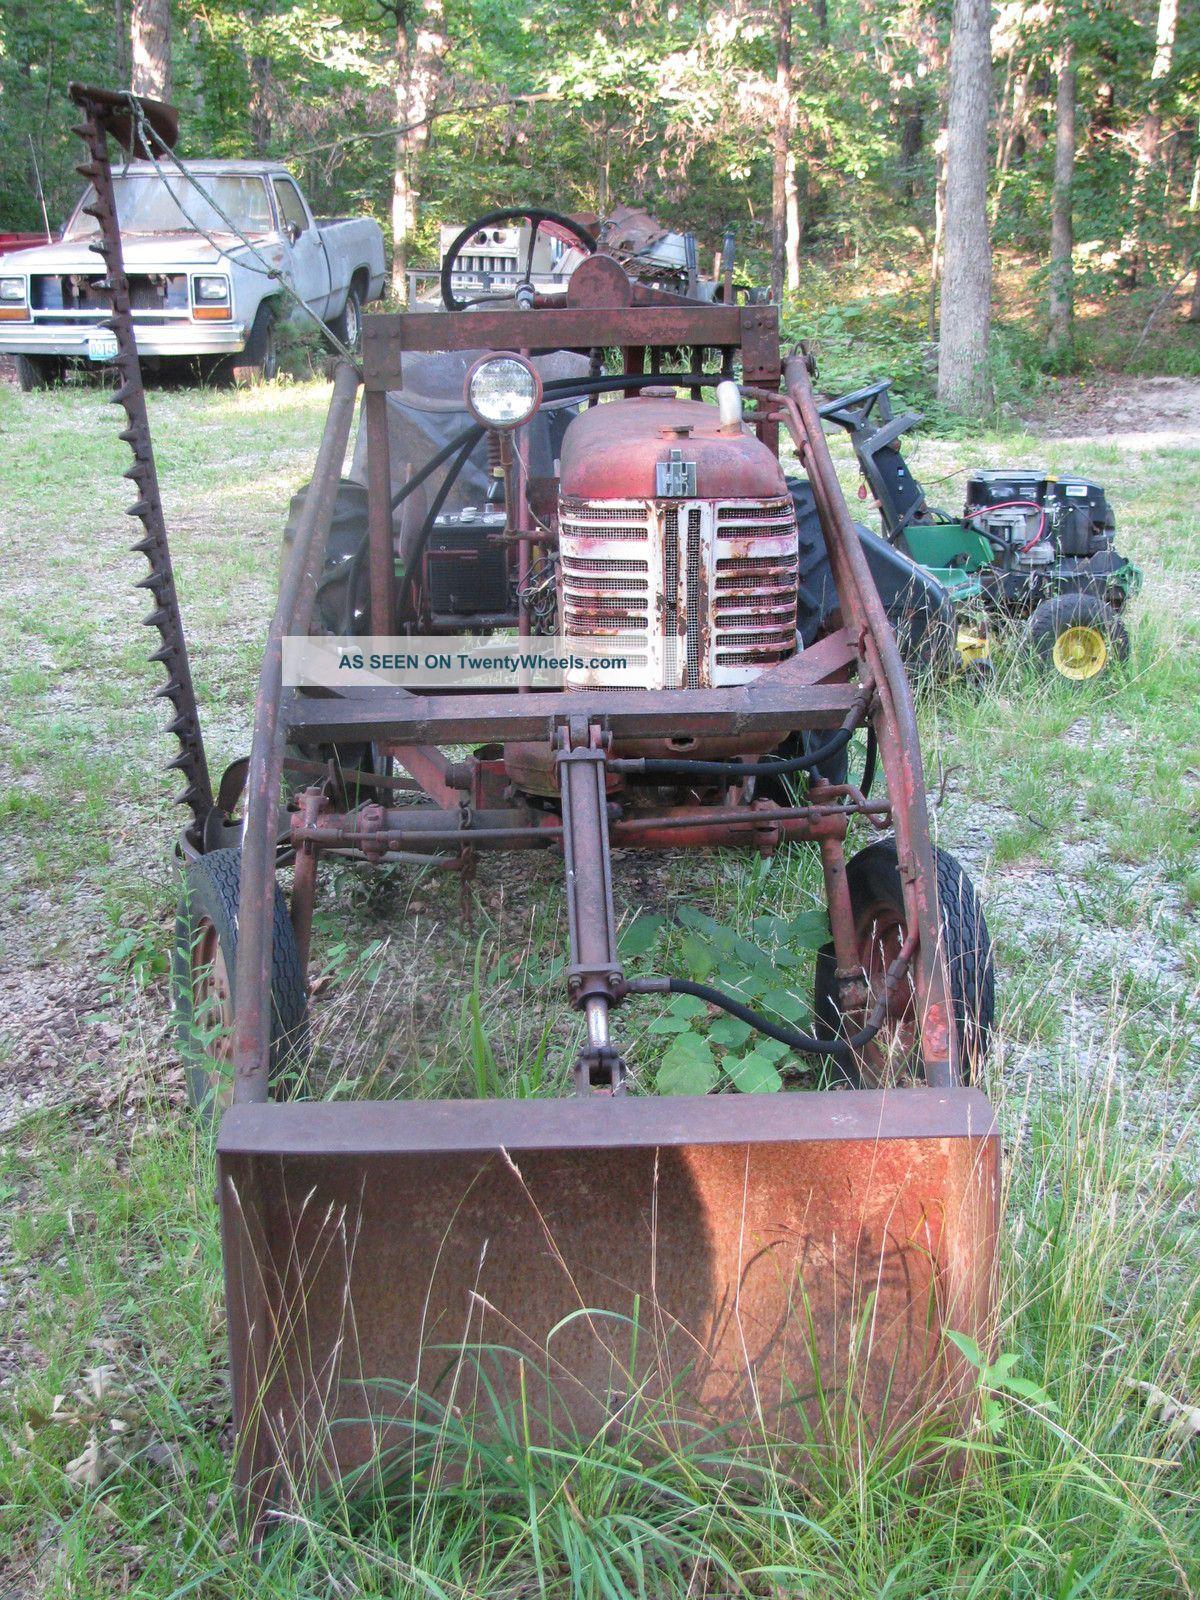 Mccormick Farmall Cub Tractor W Hydrolic Front End Loader And Sickle Mower Lgw